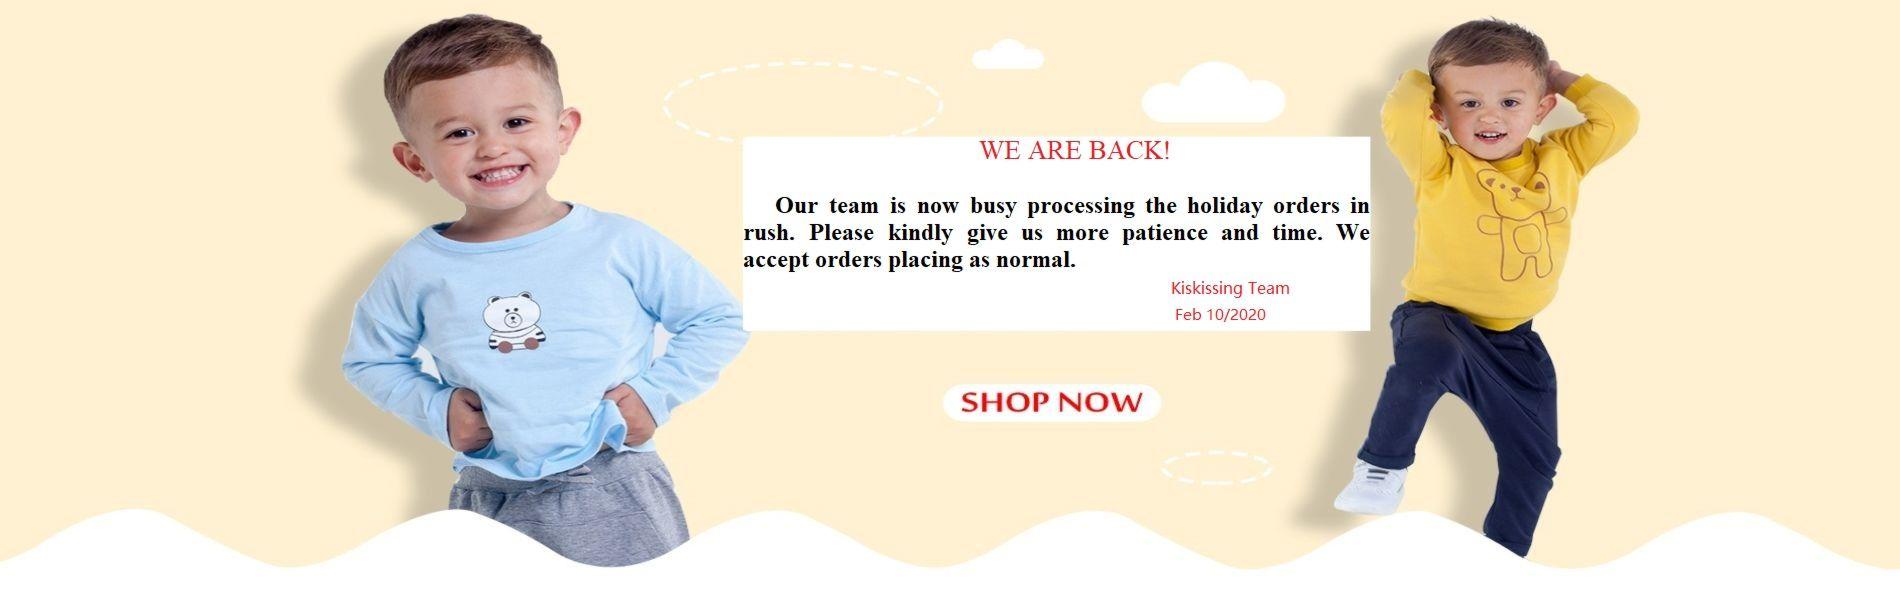 https://www.kiskissing.com/blog/post/2020-china-new-year-holiday-notice/